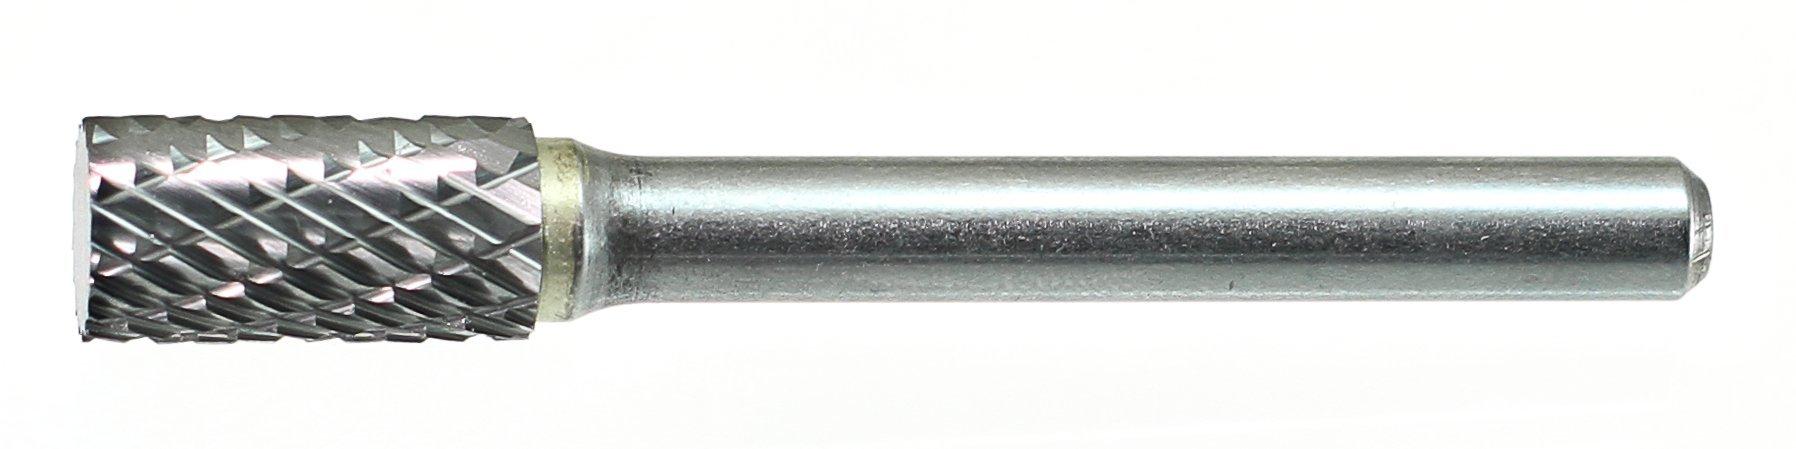 Drillco 7000A Series Magnum Solid Carbide Bur, Double Cut, Cylindrical Flat End, 1/4'' Shank Diameter, 3/8'' Head Diameter, 3/4'' Cutting Length (Pack of 1)